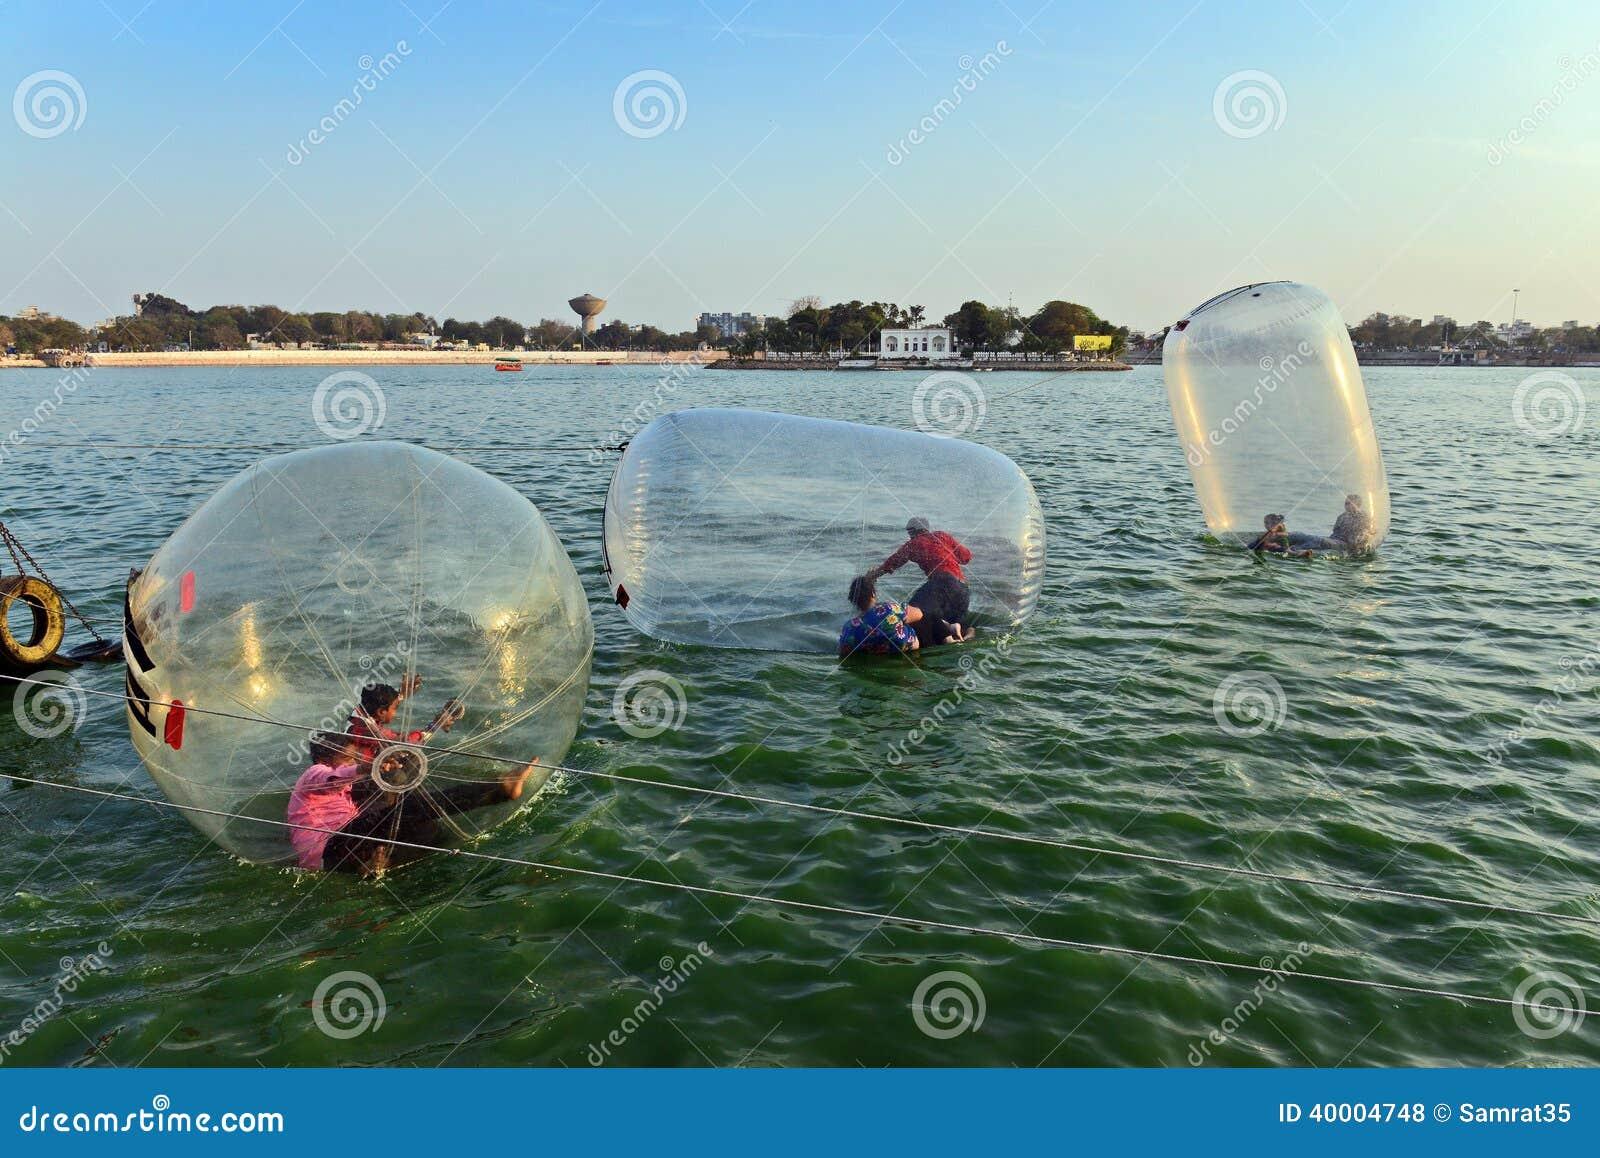 Water Park In Ahmedabad Kankaria